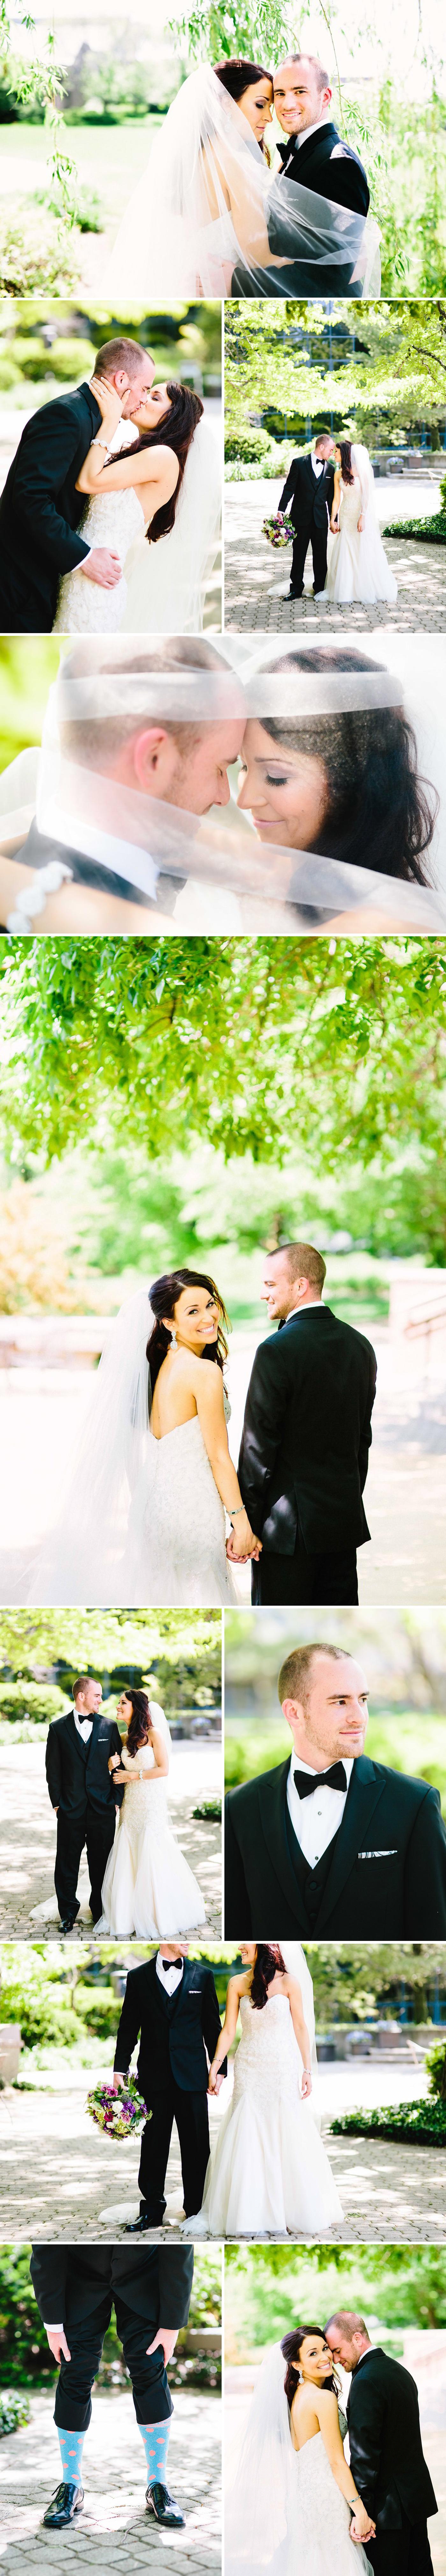 chicago-fine-art-wedding-photography-alger3